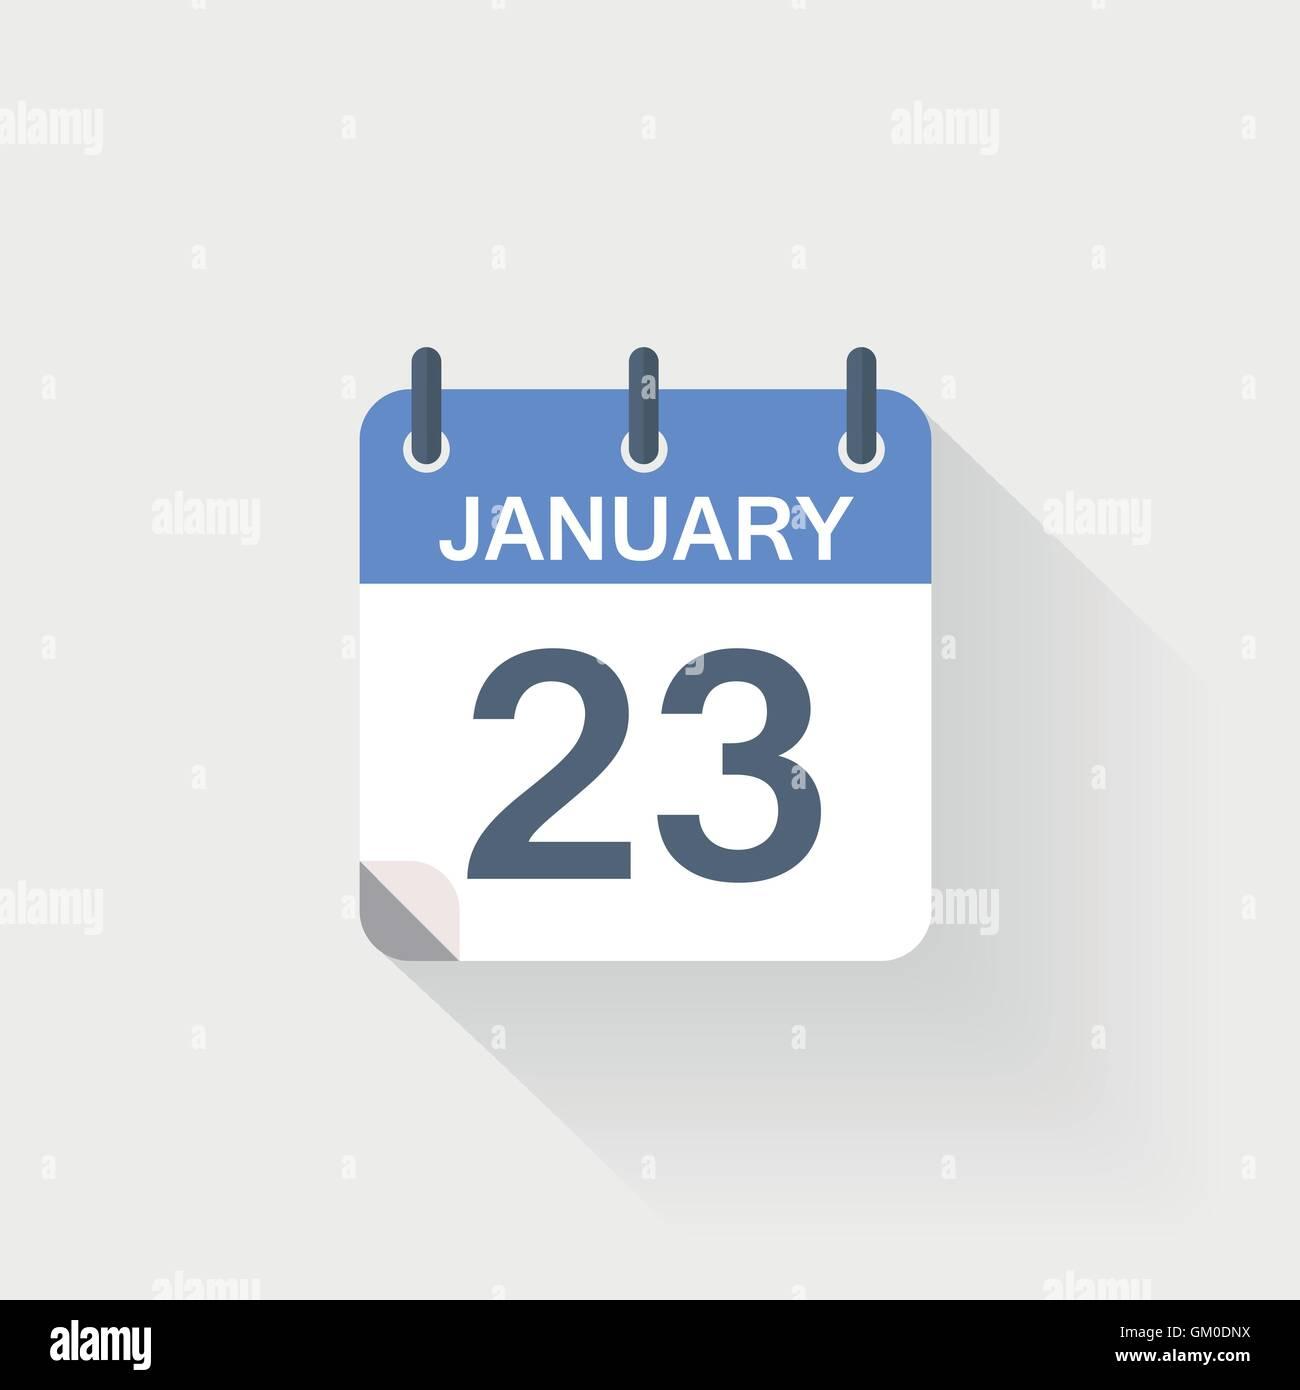 23 january calendar icon on grey background - Stock Vector